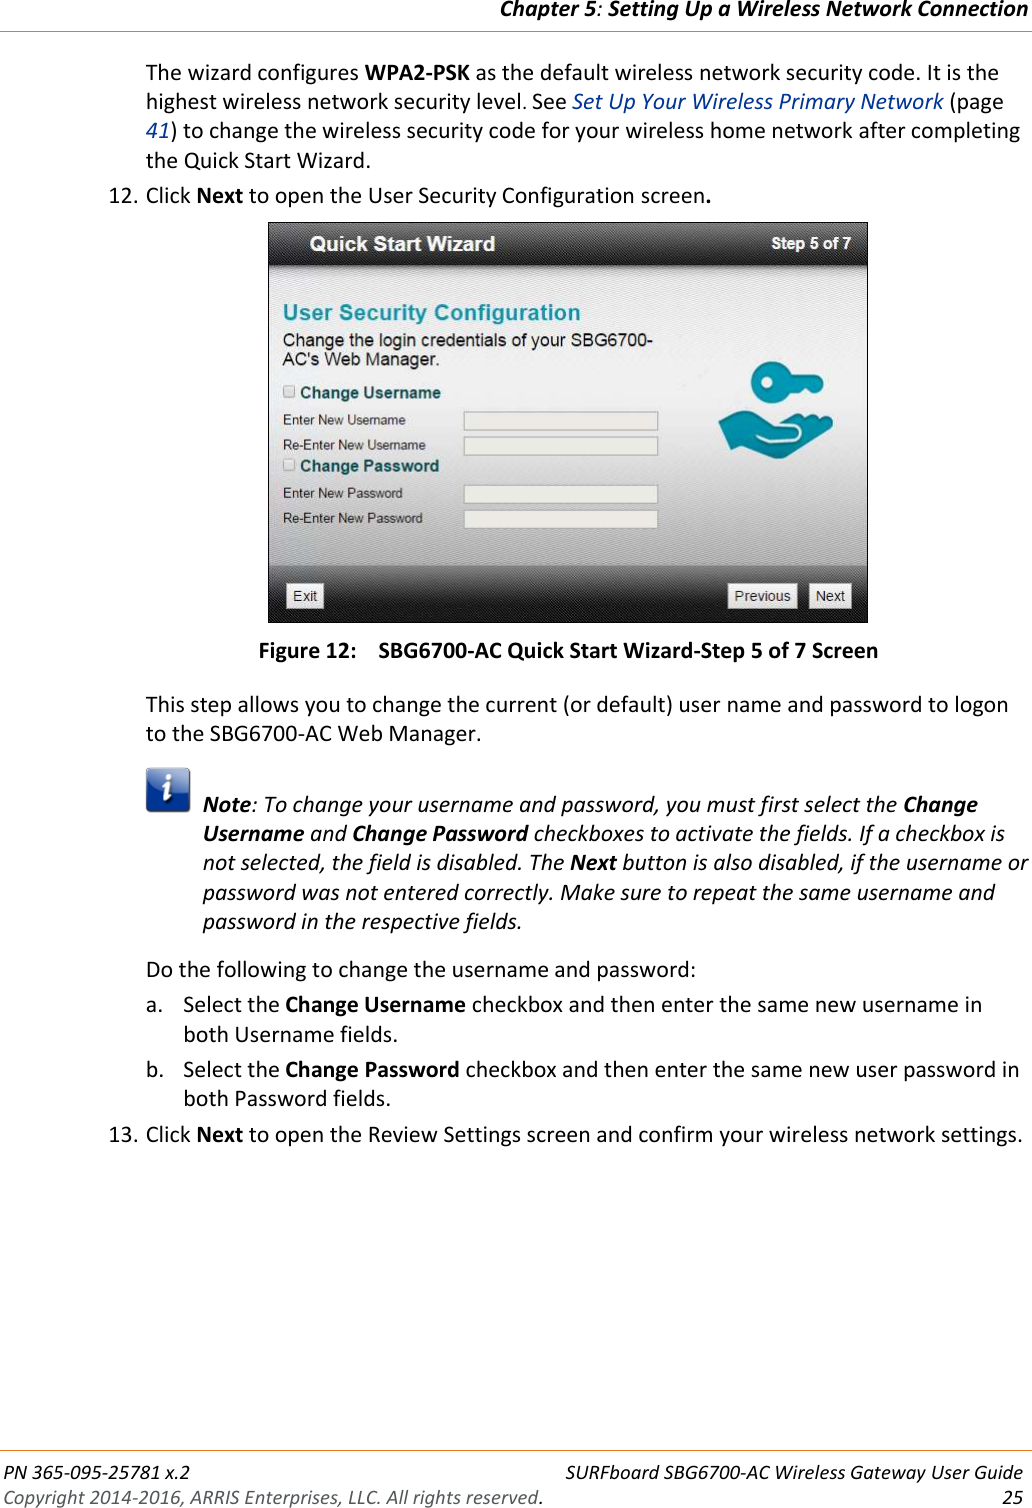 Arris SBG6700 AC User Guide Manual SBG6700: